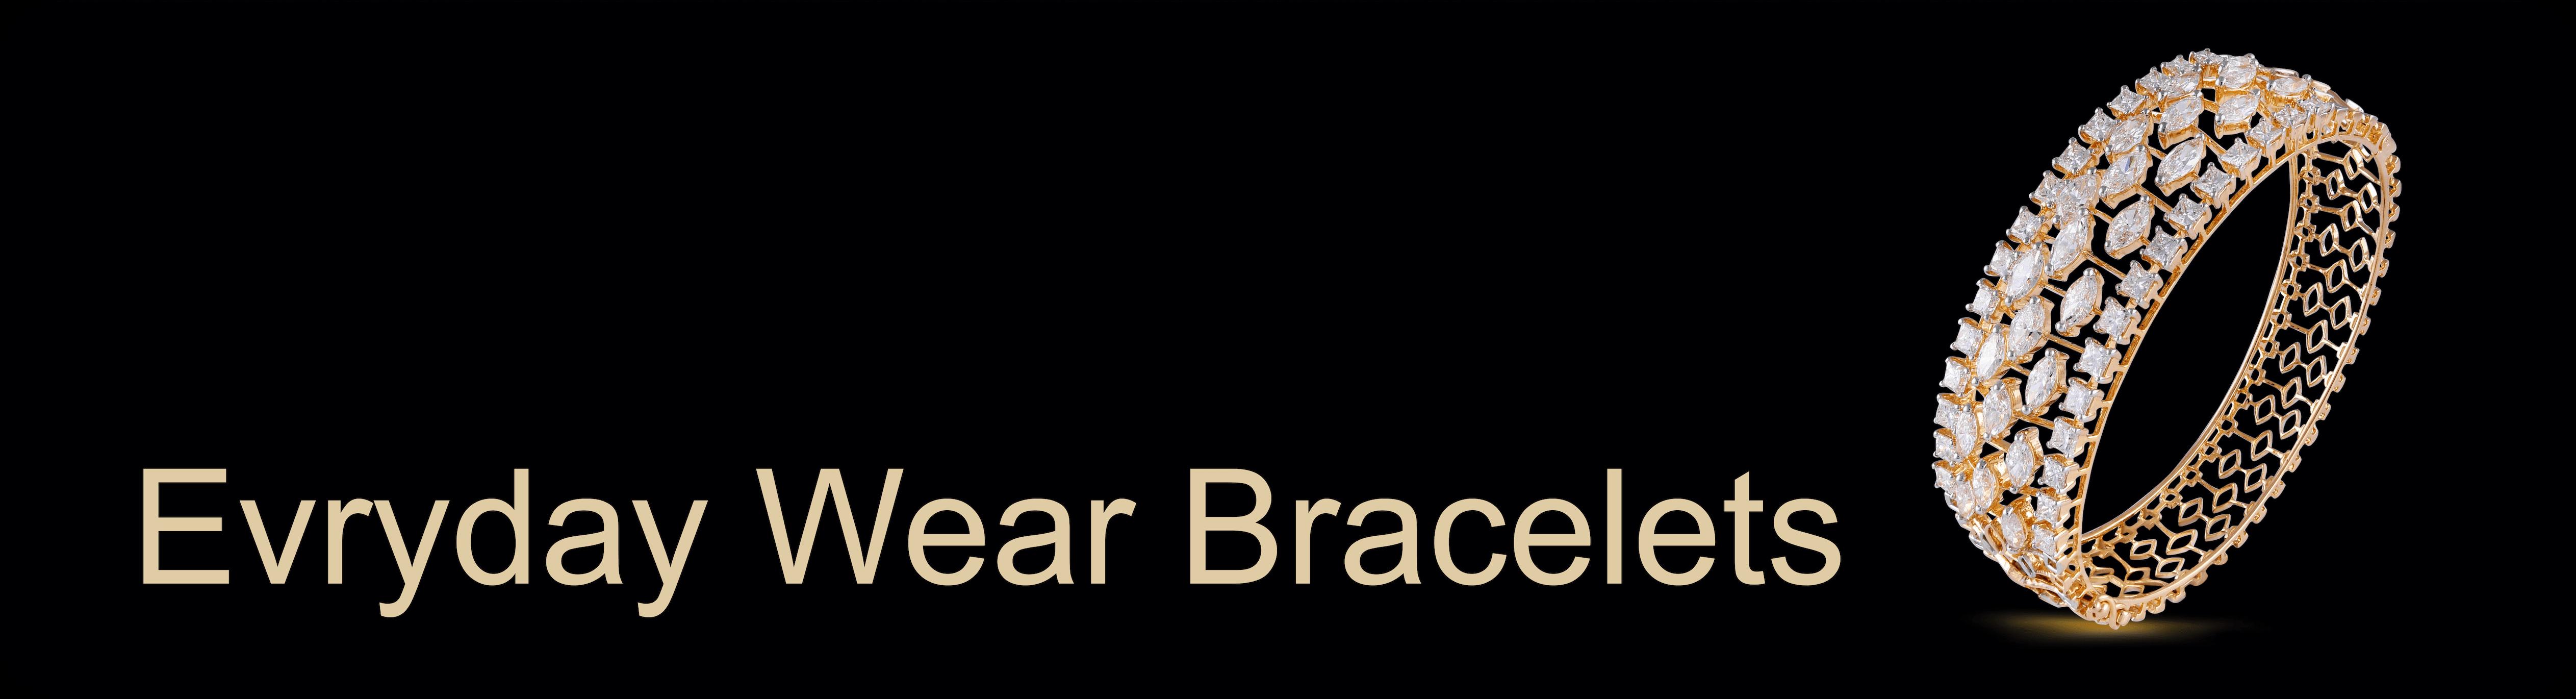 Light Wt Bracelets